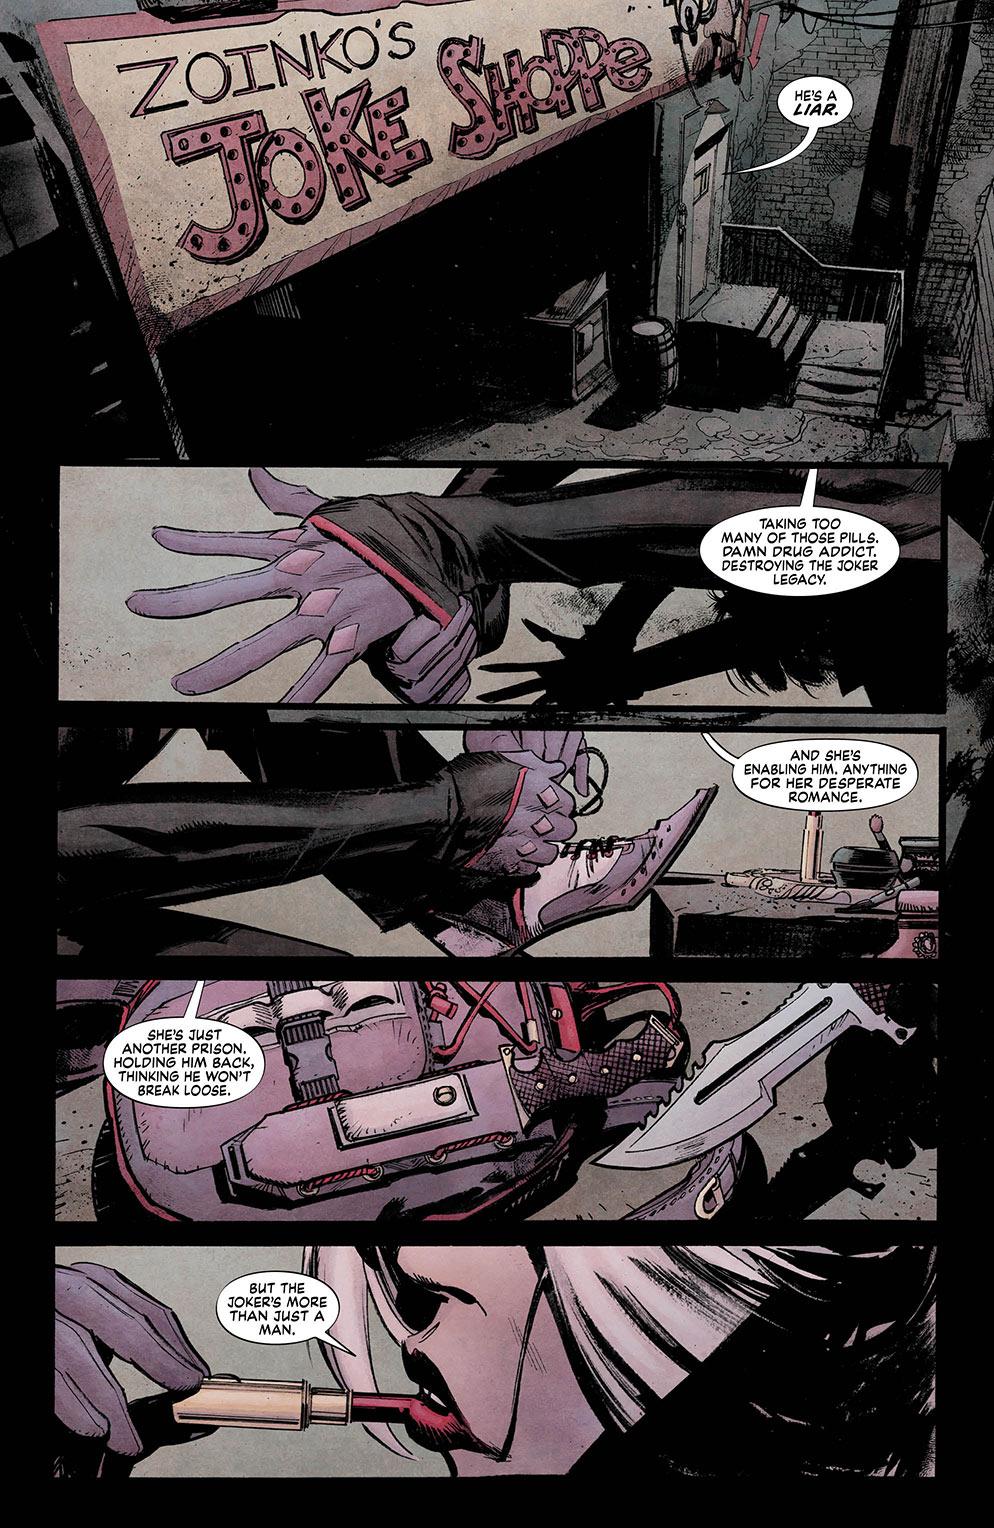 Batman White Knight 3_1 - DC Comics News